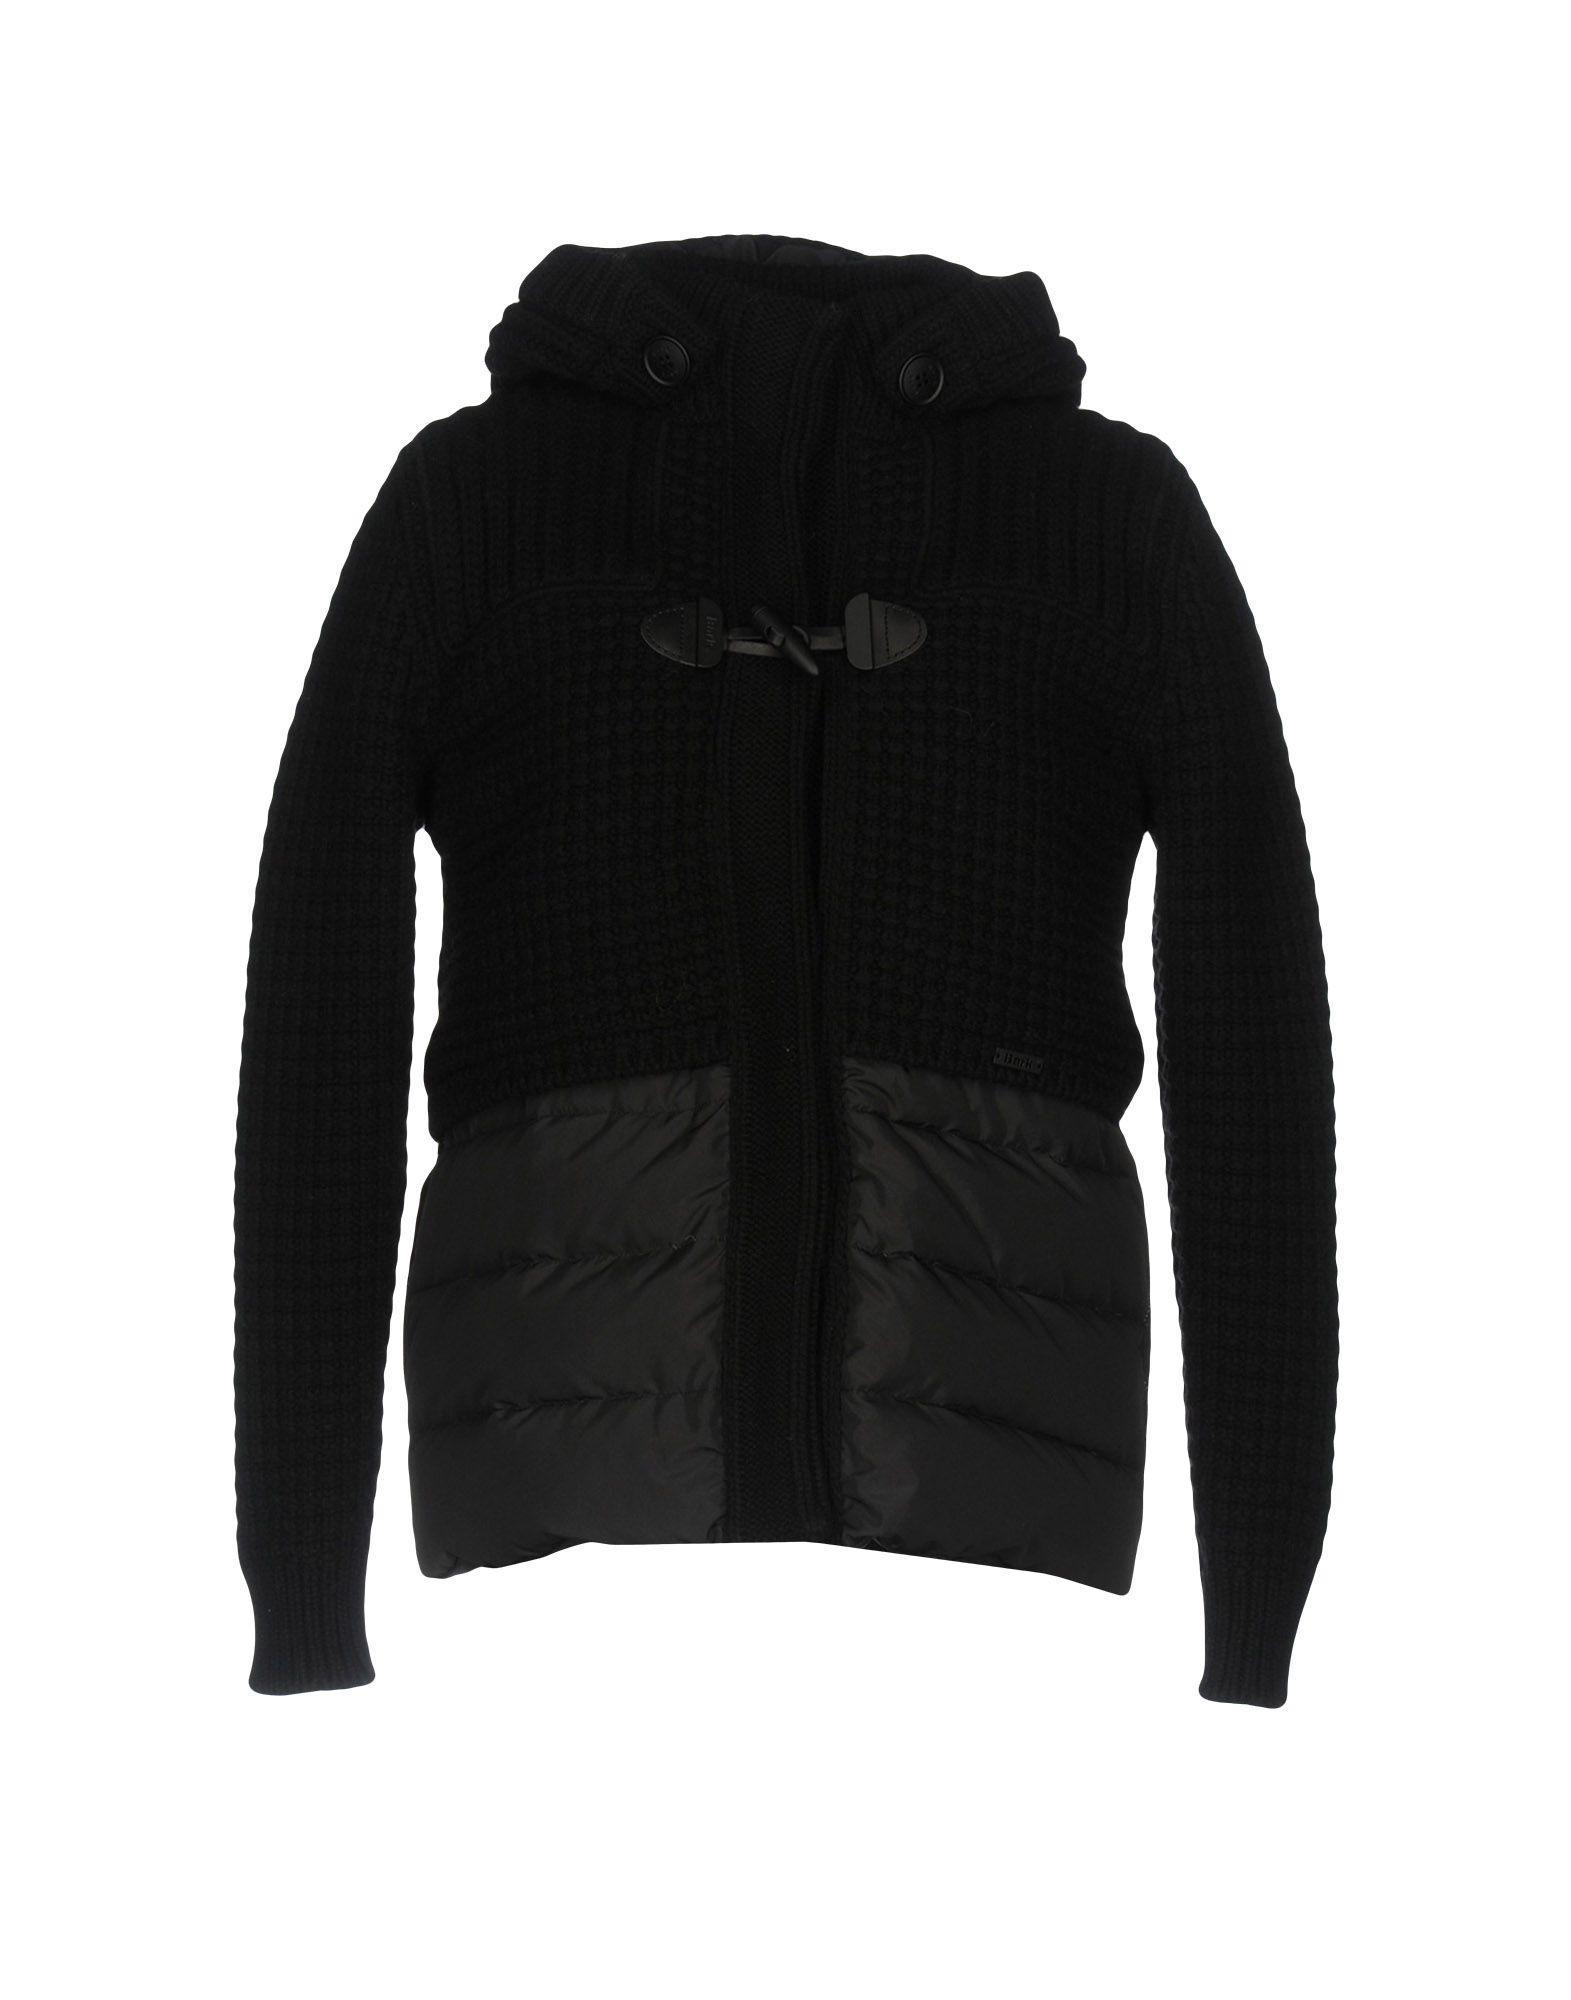 Bark Down Jacket In Black